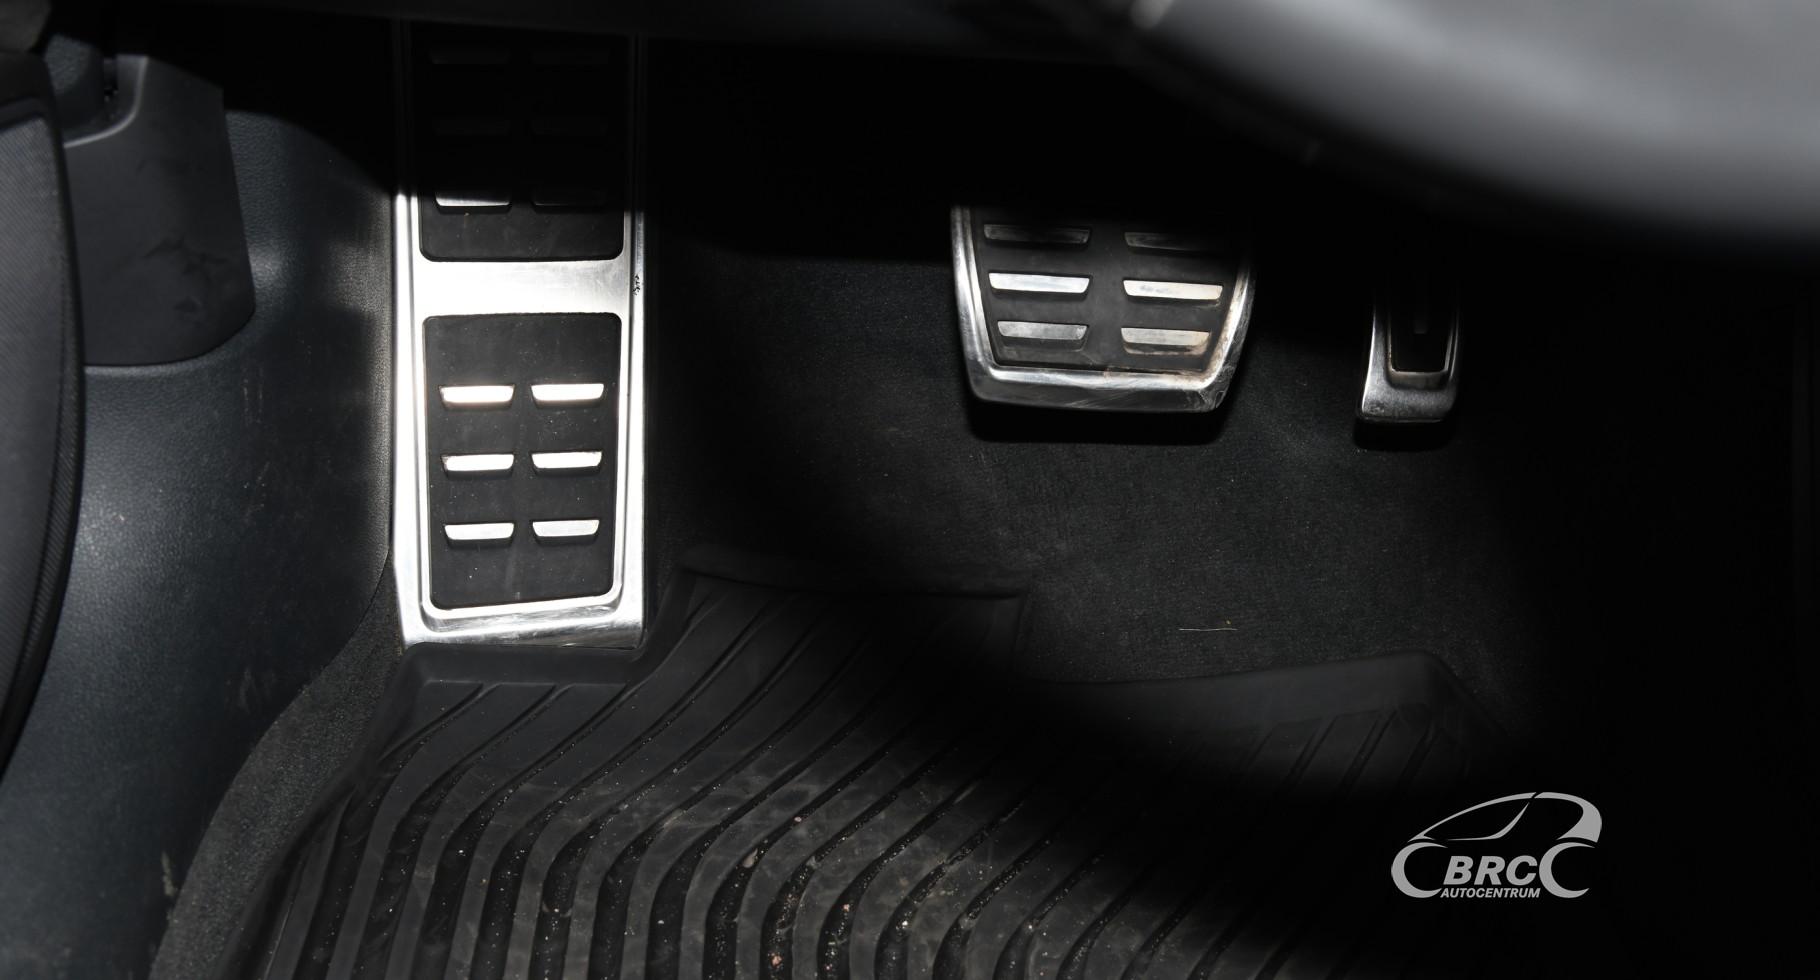 Audi A6 3.0 TDI Quattro Competition S-Line Automatas